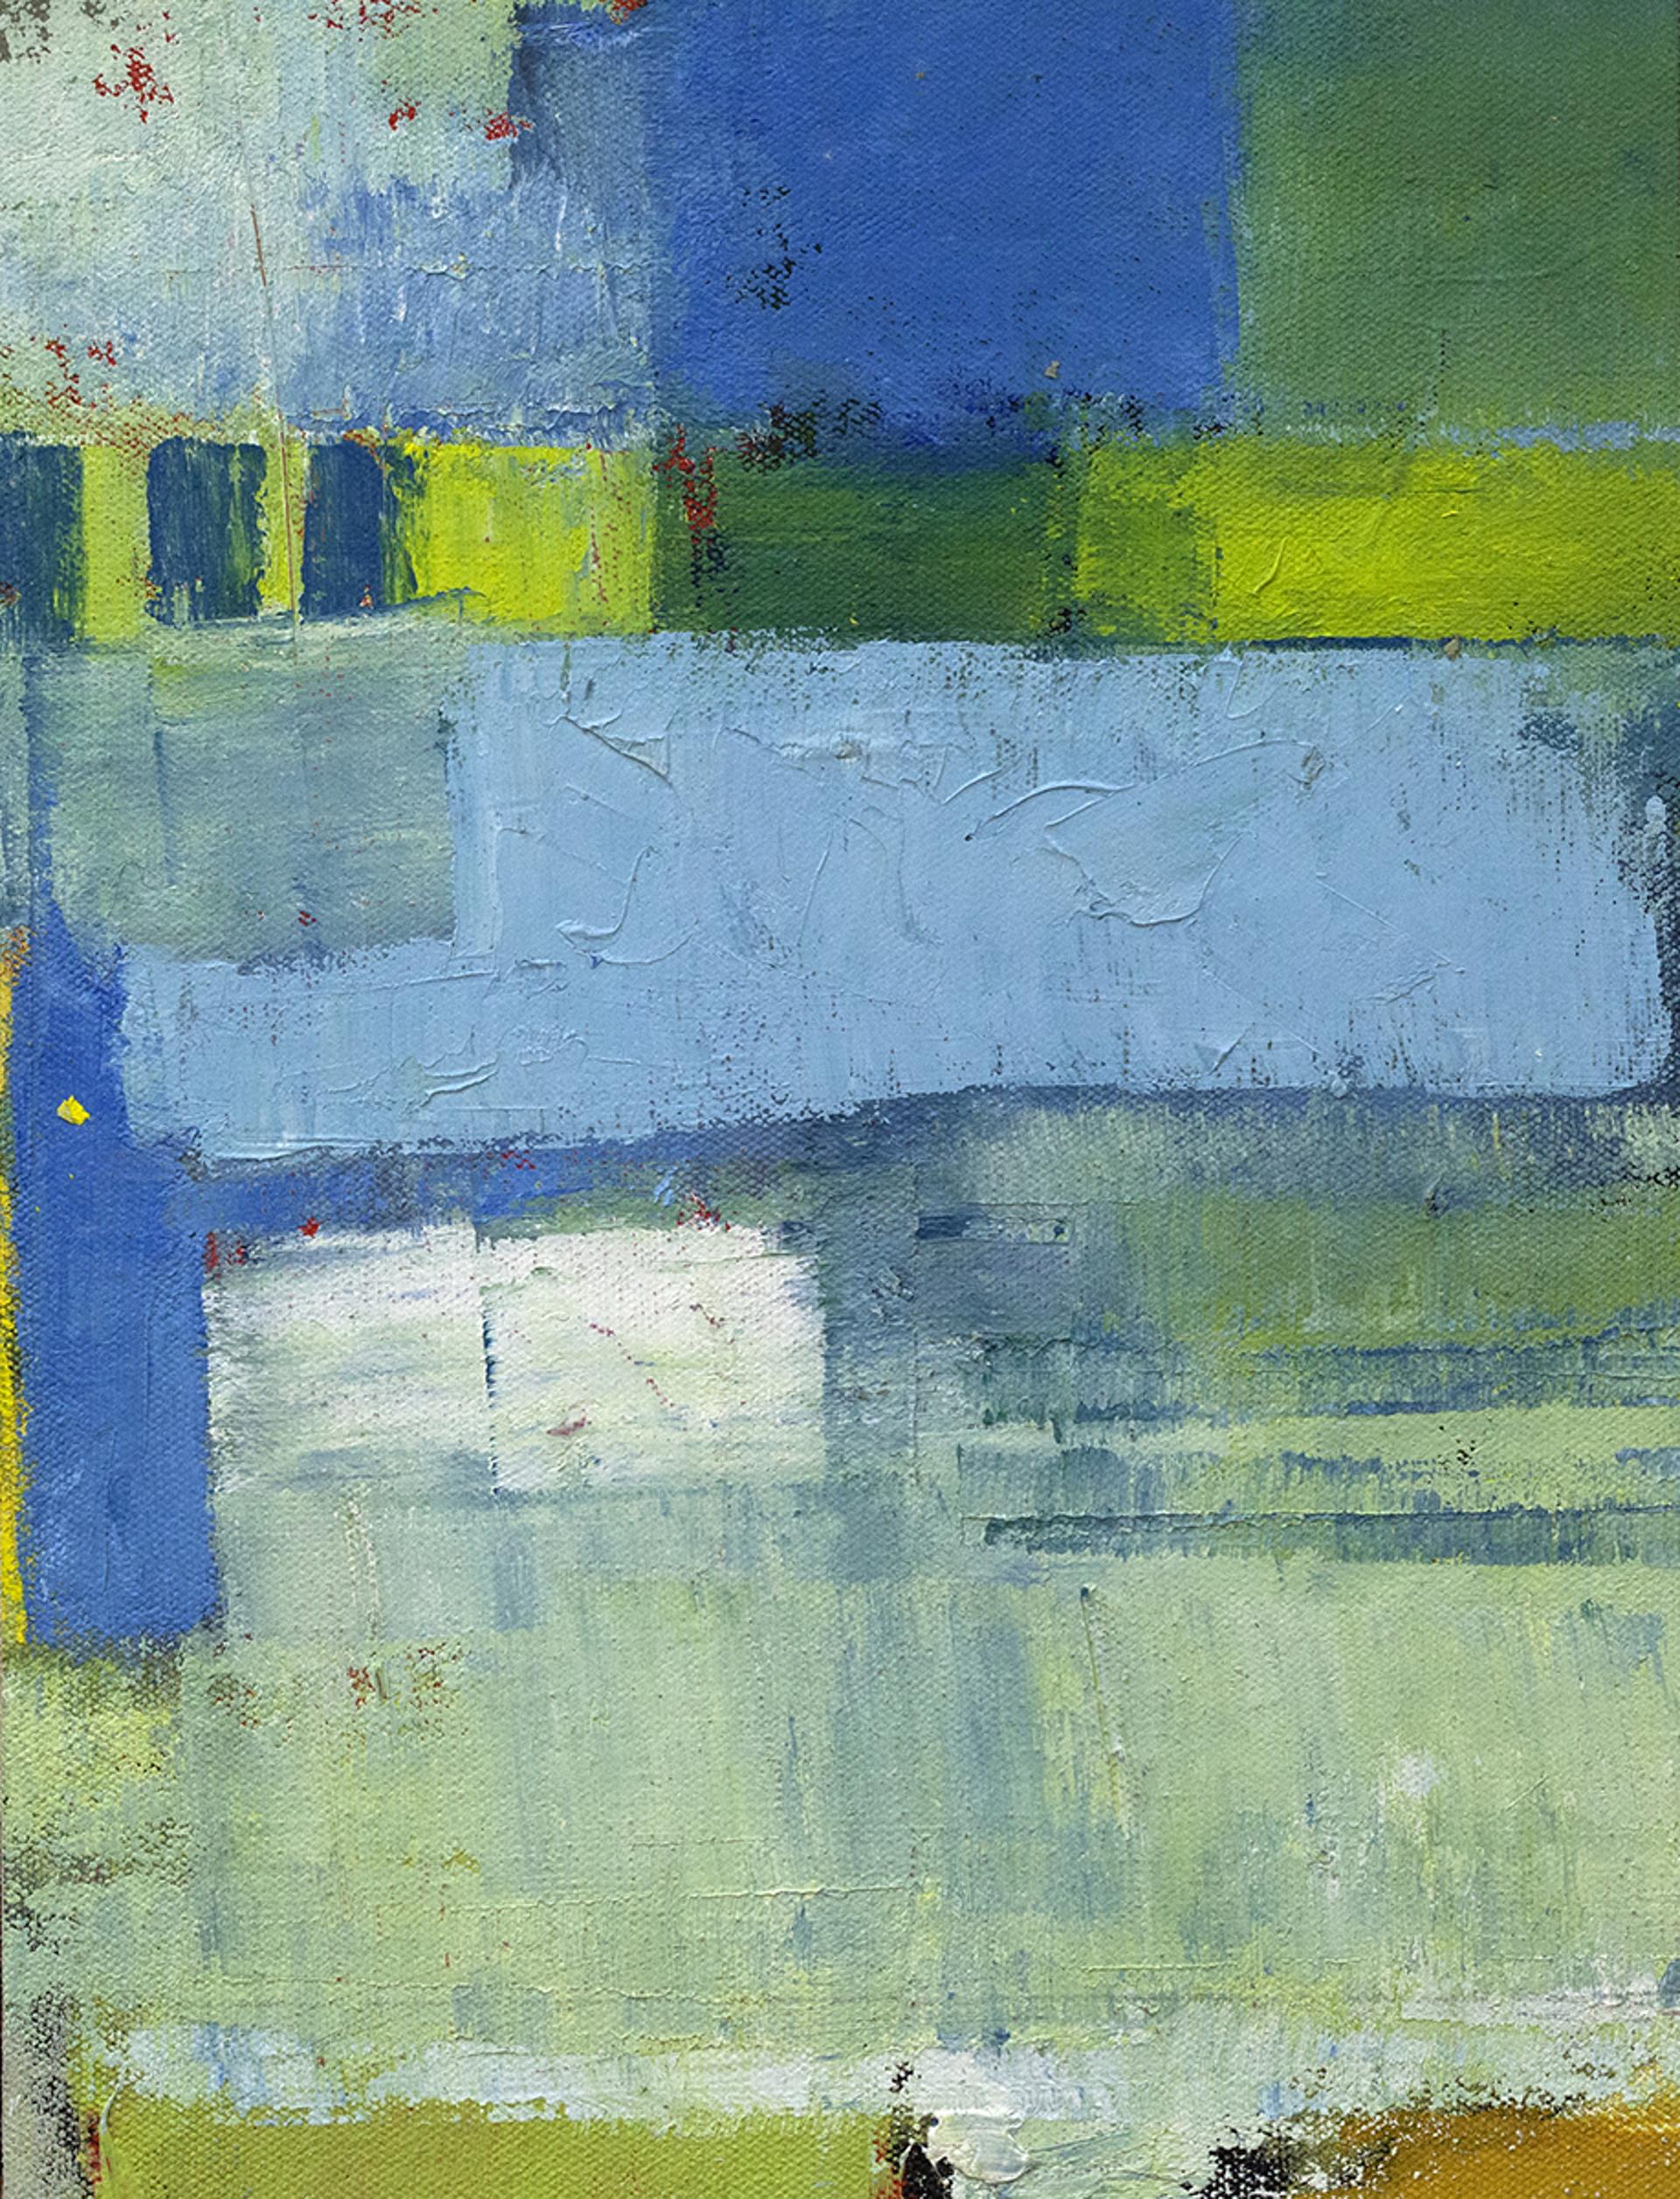 Water's Edge by John McCaw